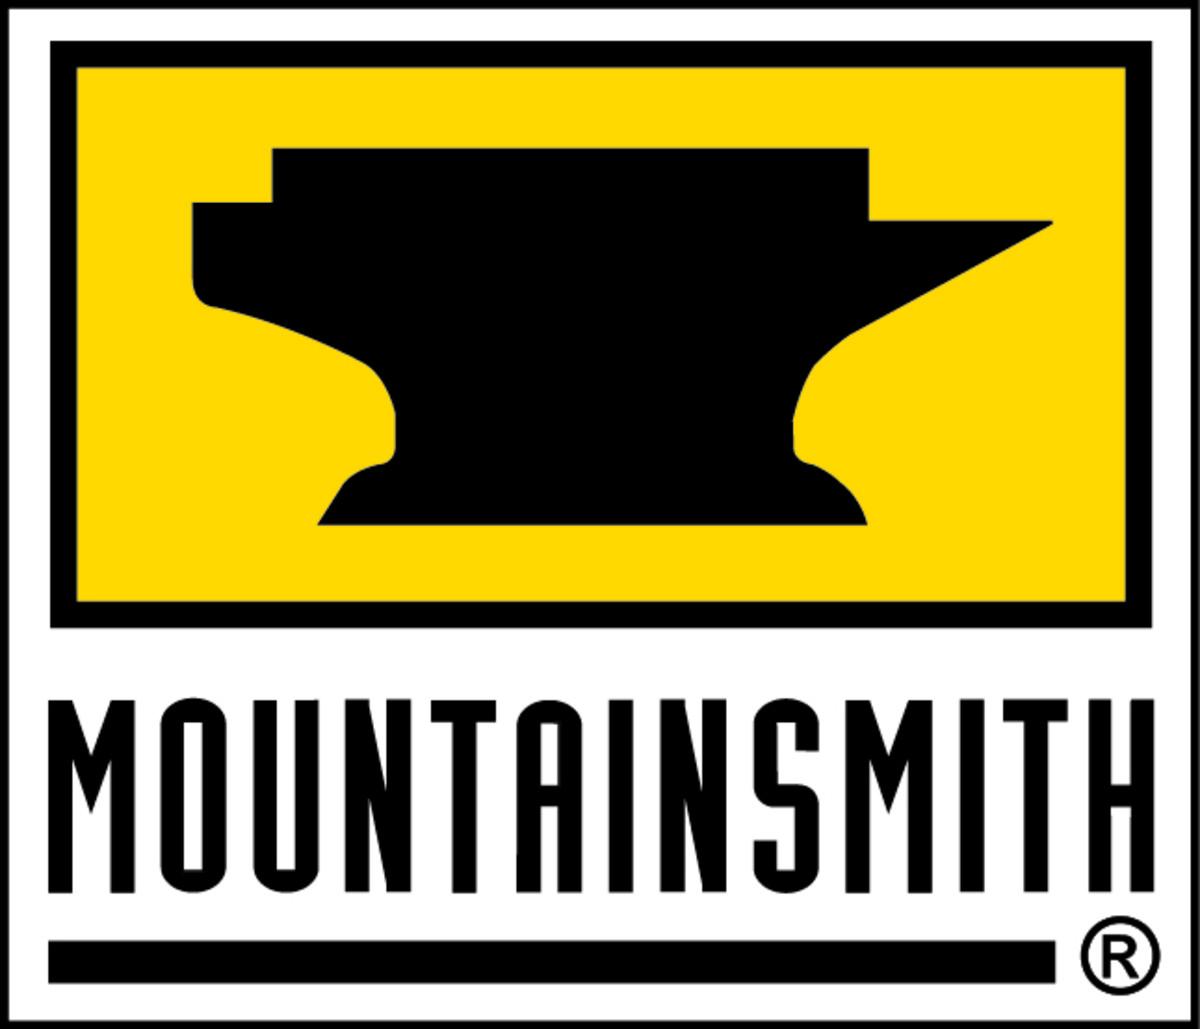 mountainsmith-logo.jpg